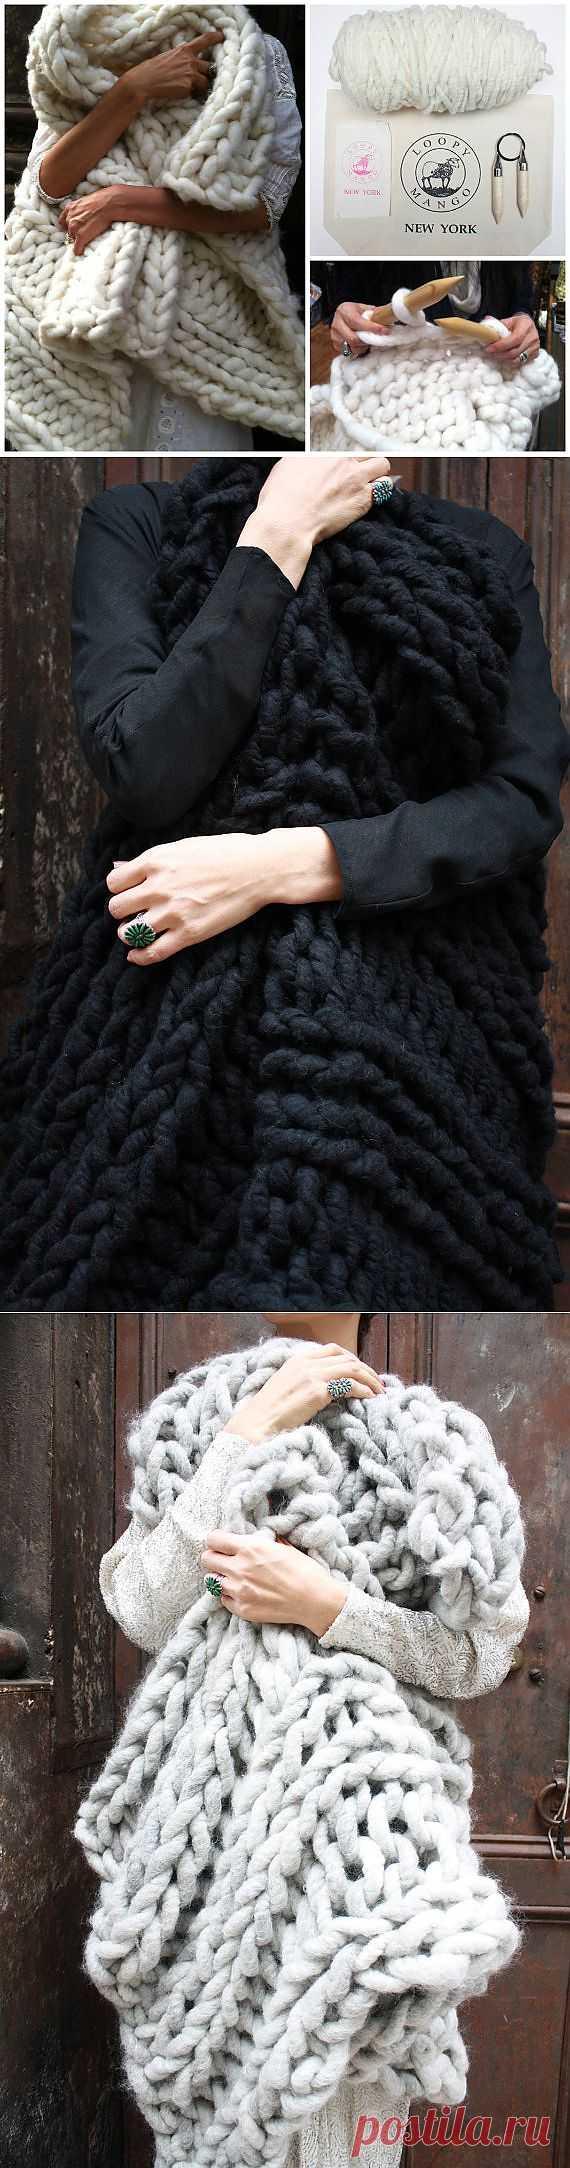 Big Loop Merino Chunky Knit Blanket or Rug Knit Kit от loopymango  крупная пряжа